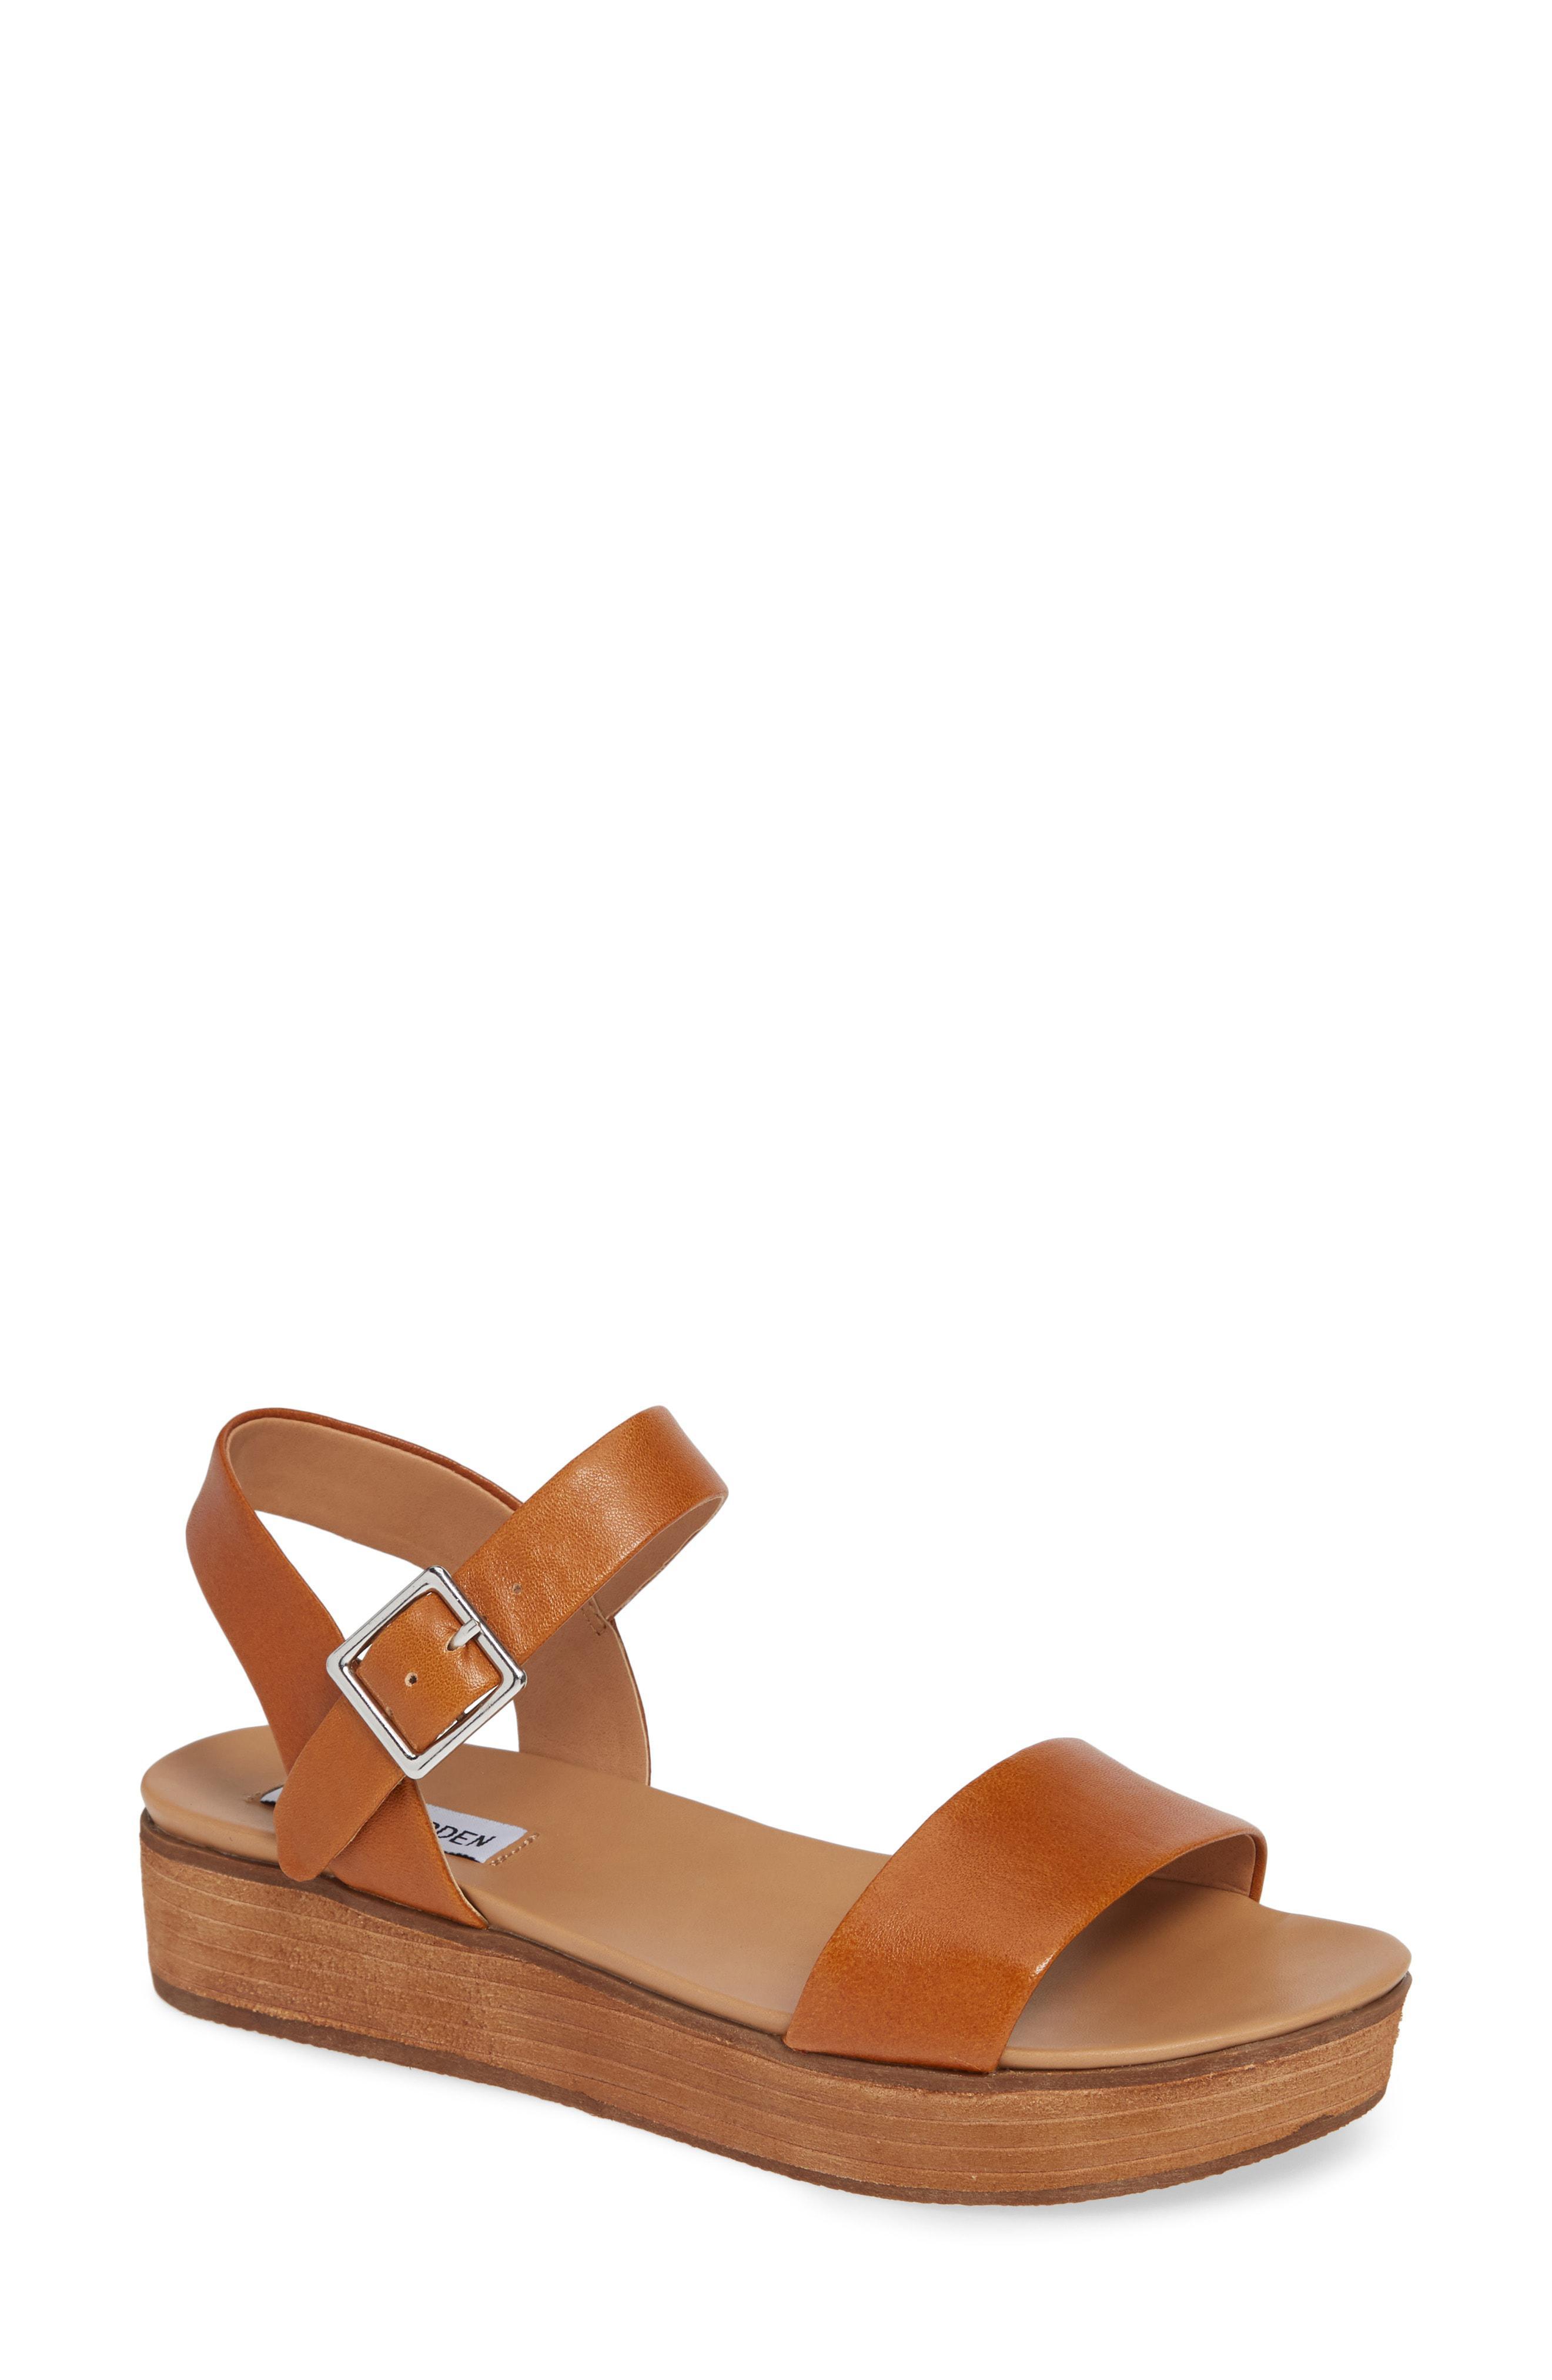 4d6e7dc0a98 Lyst - Steve Madden Aida Platform Sandal in Brown